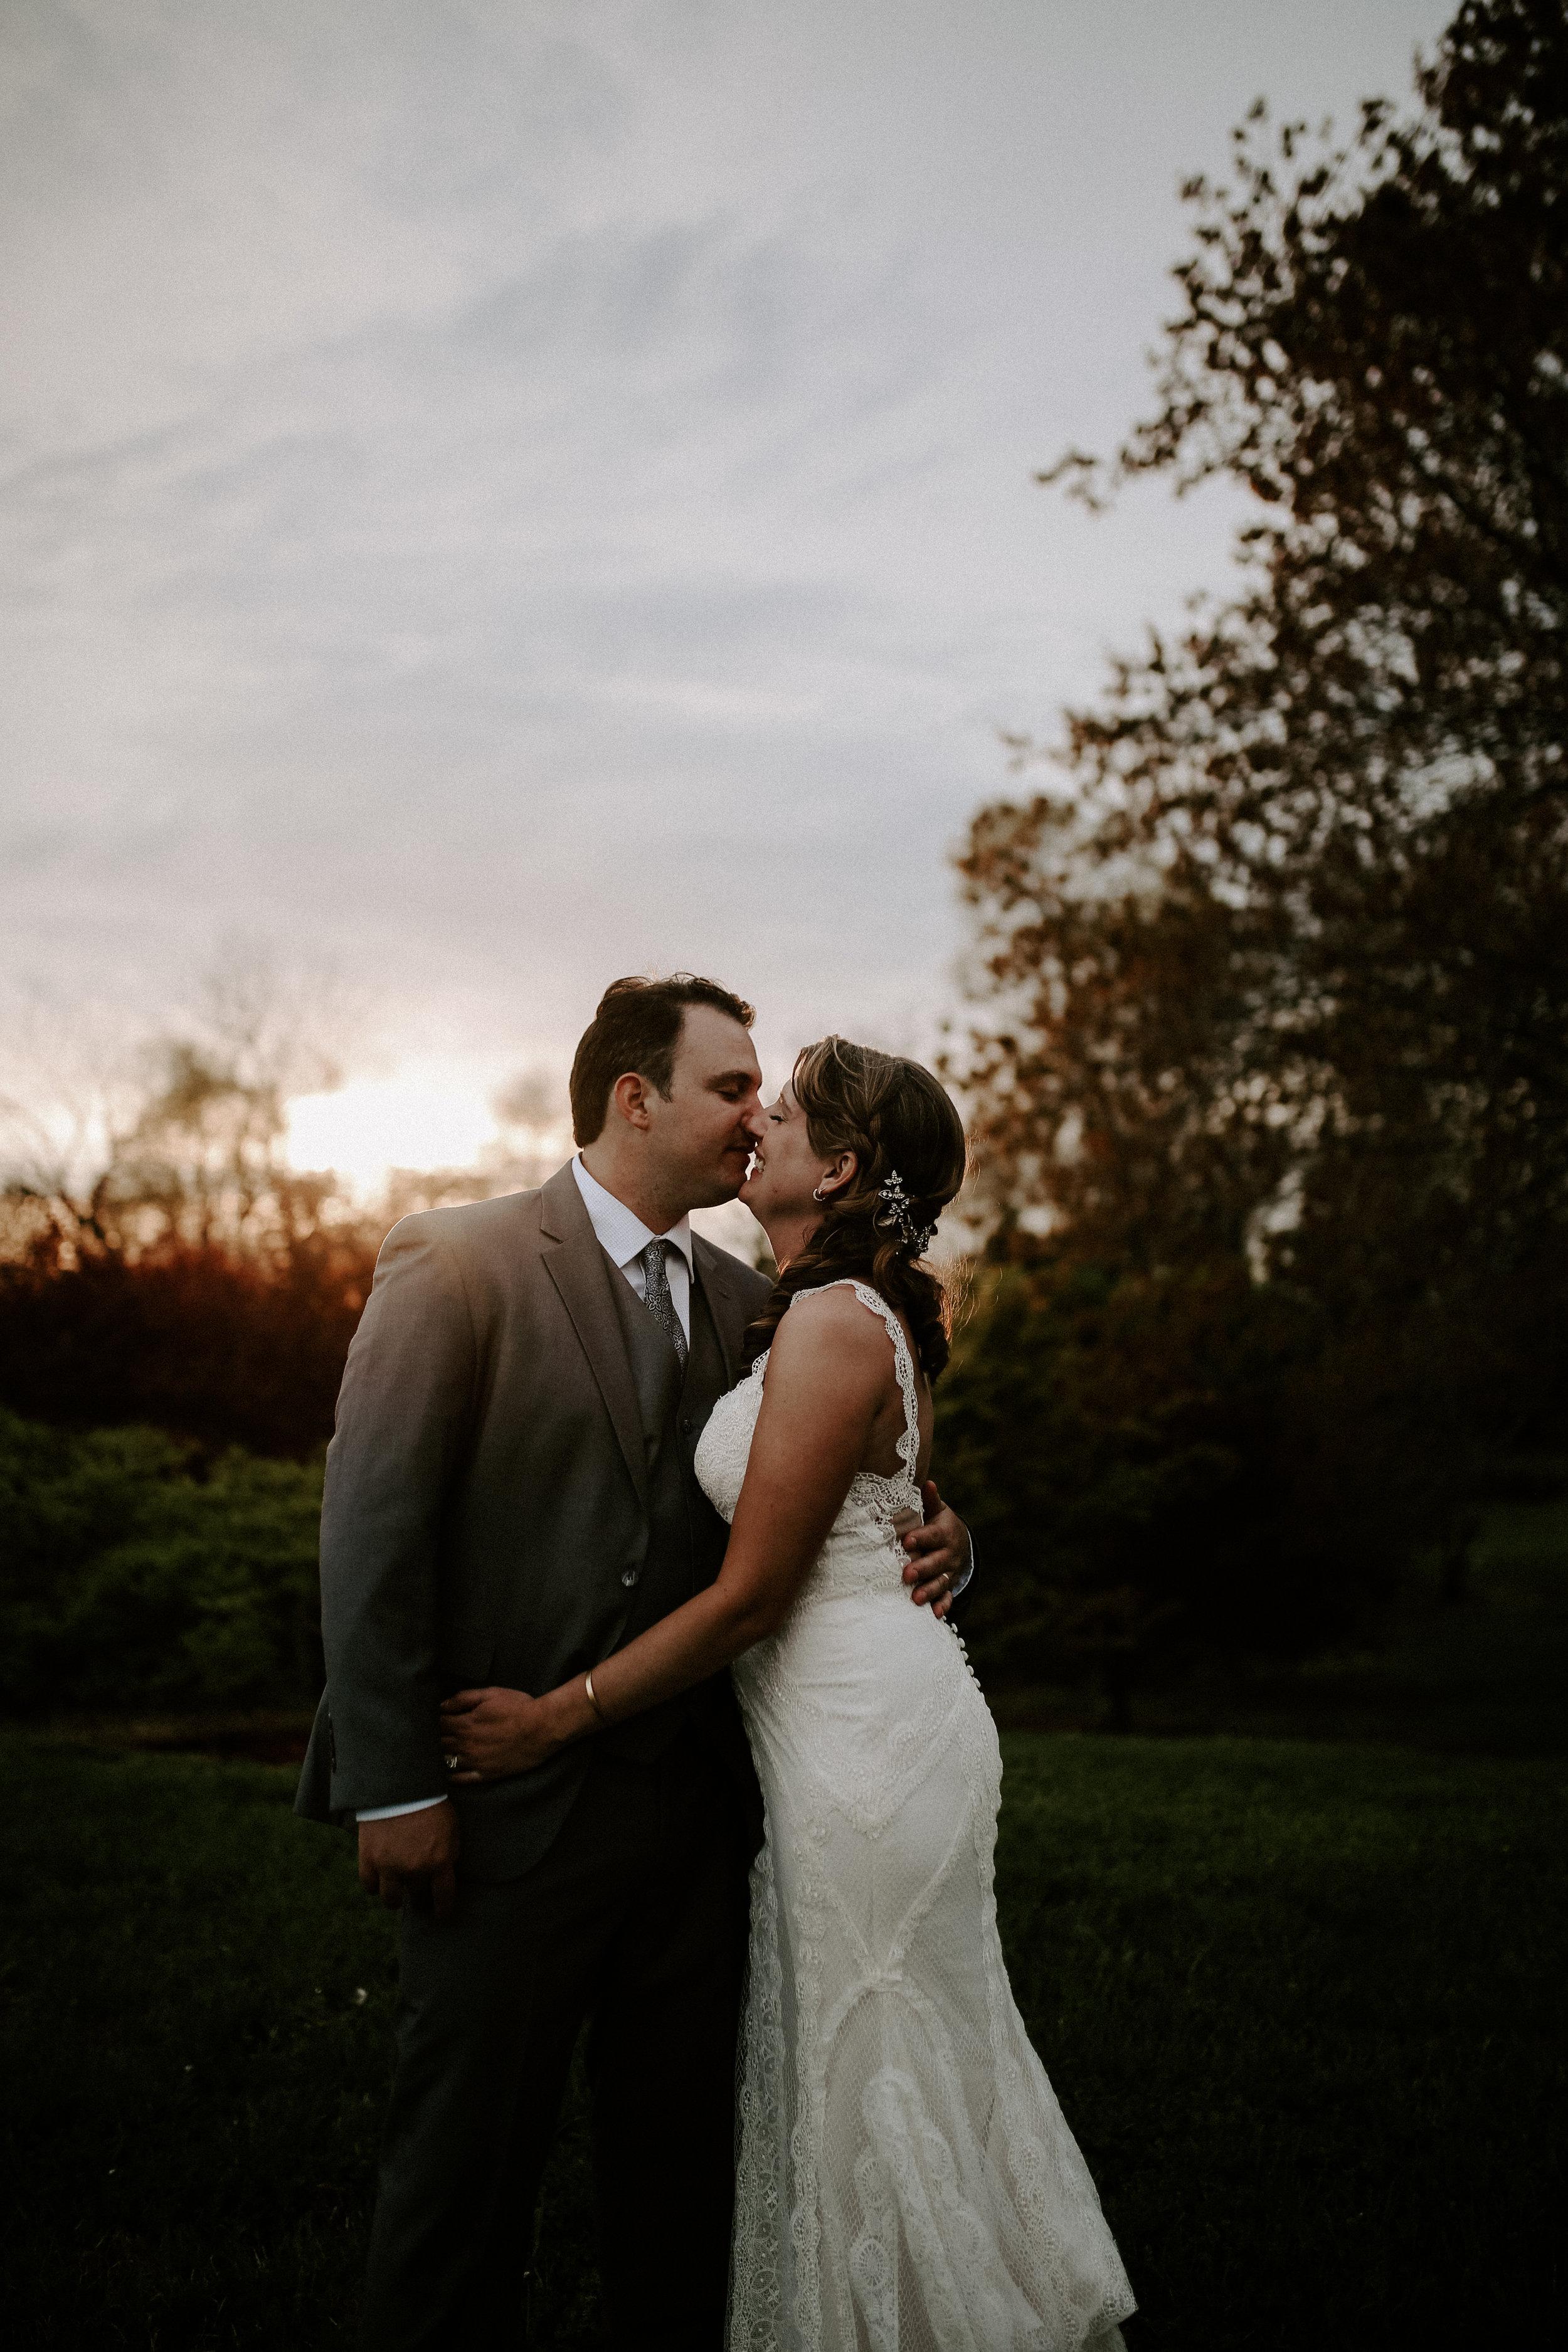 TheGreens_Married_2019-513.jpg